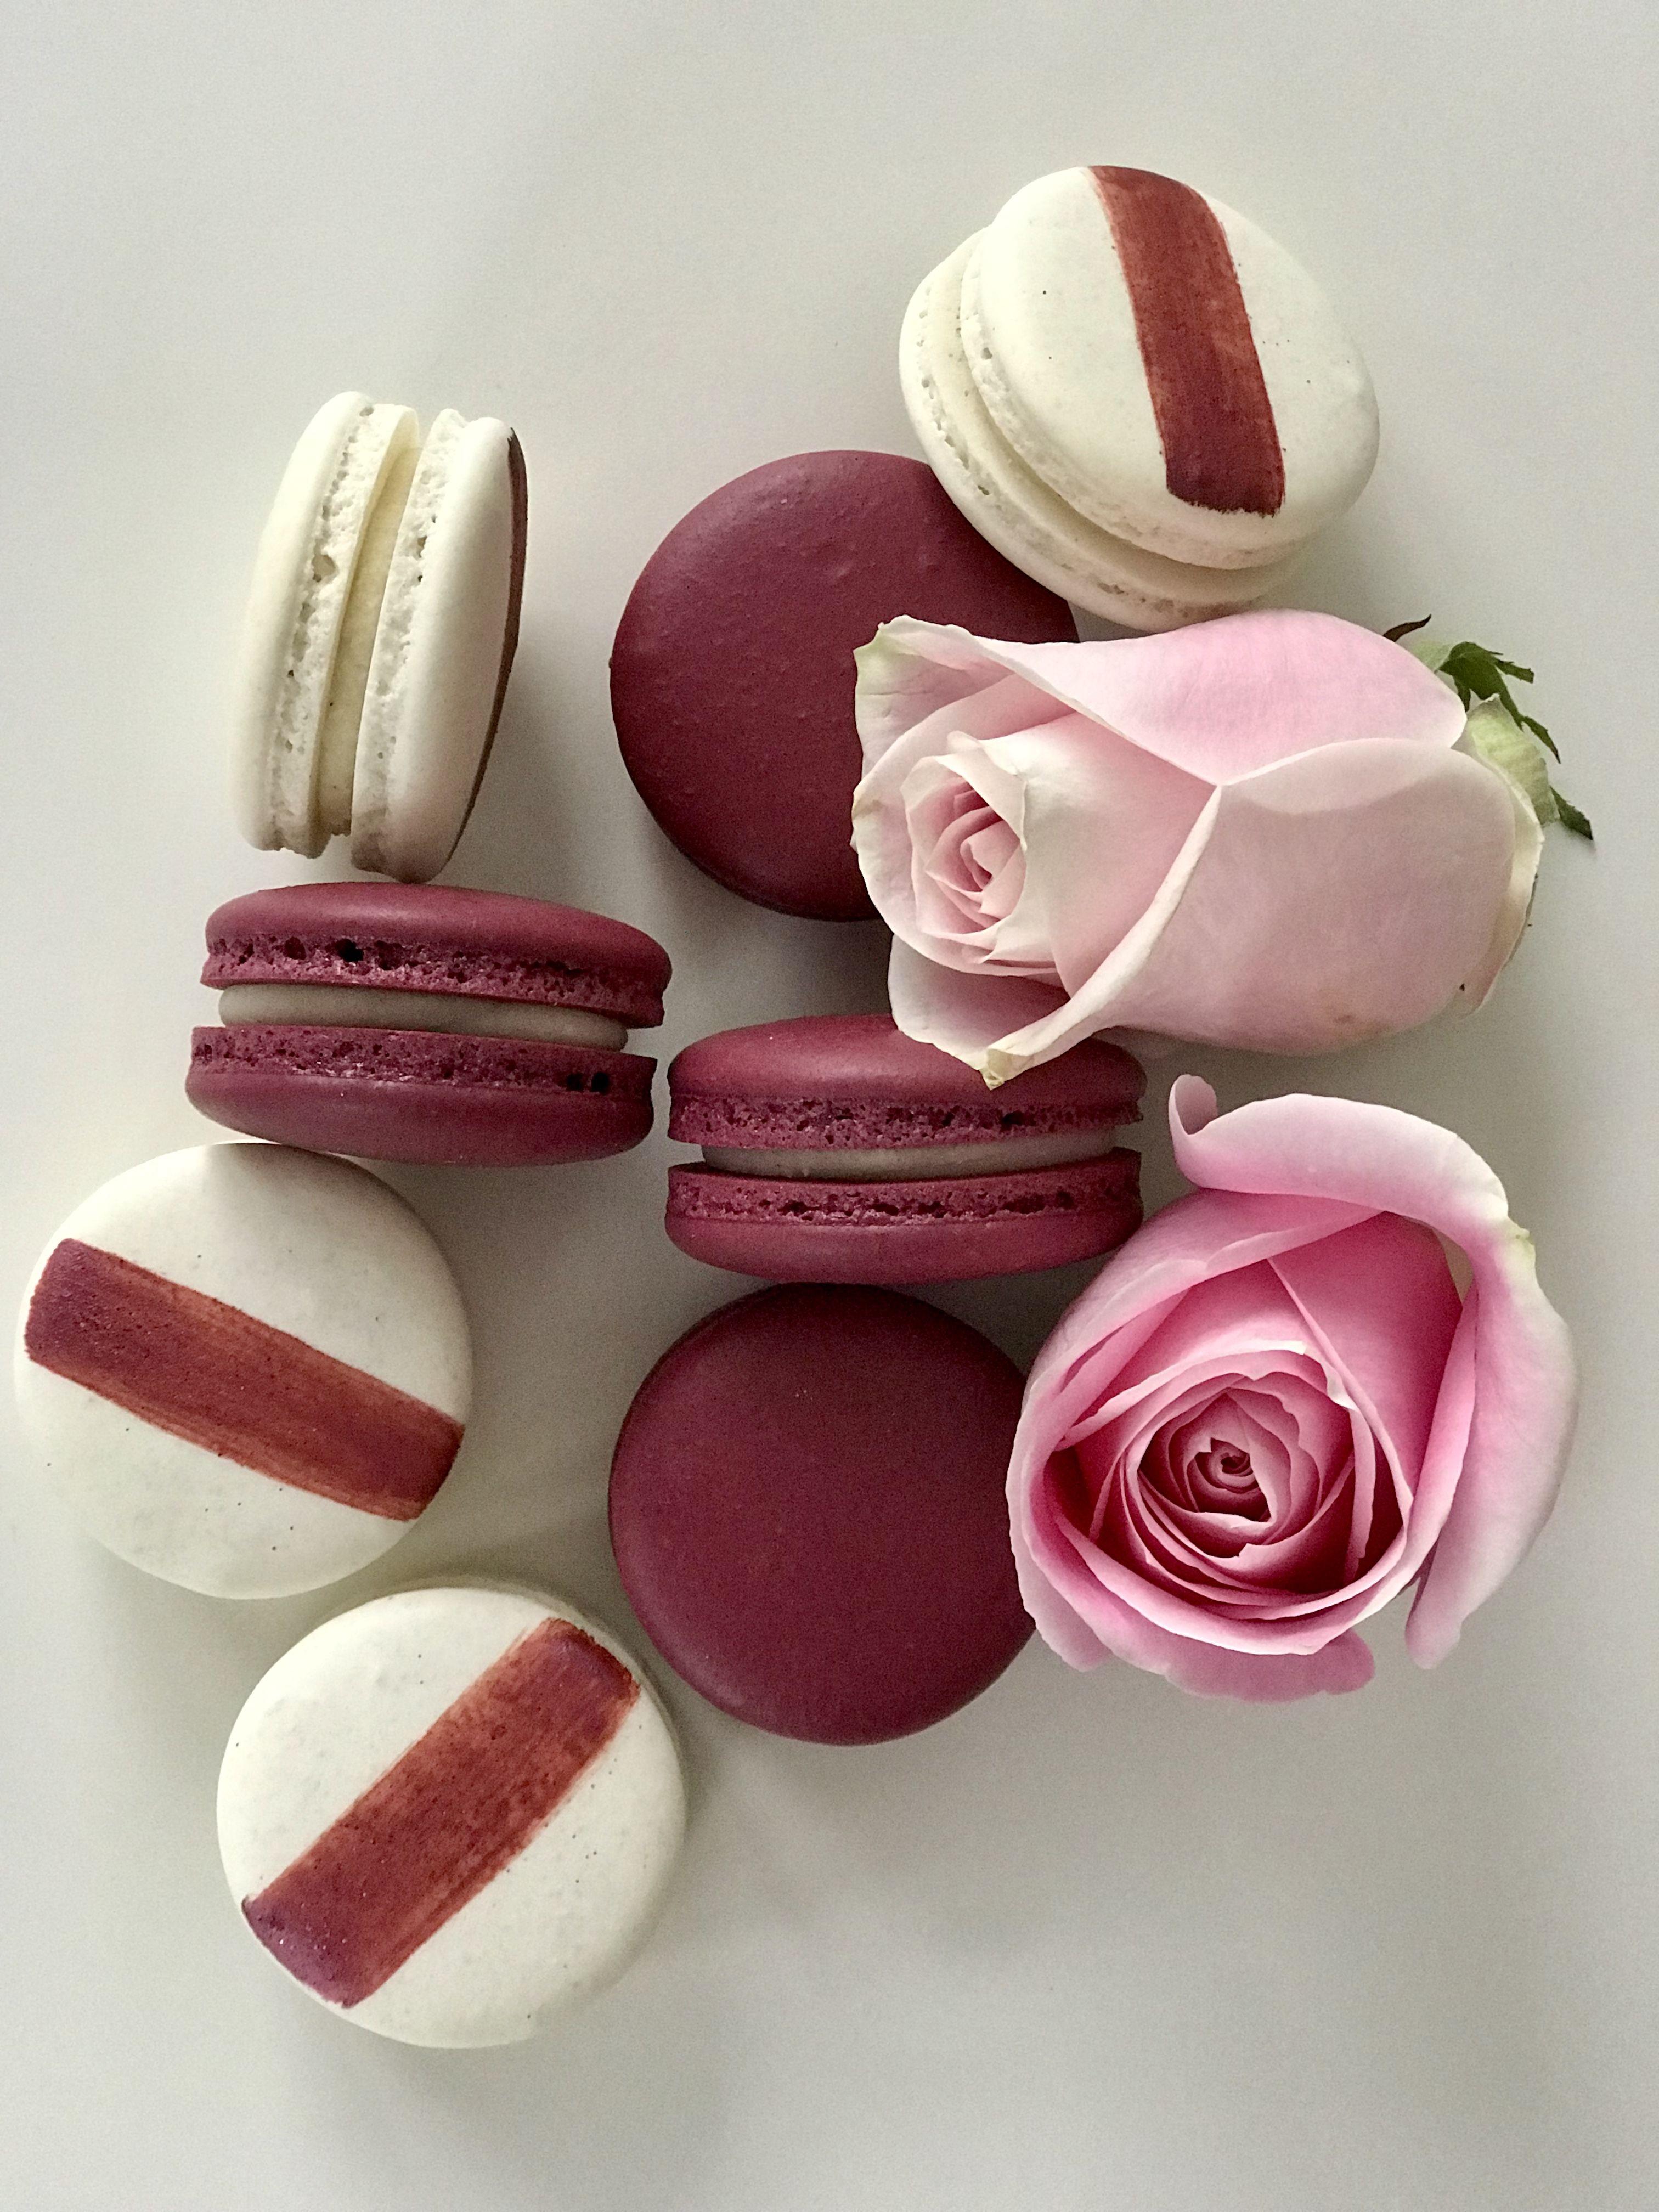 Burgundy Wine Macarons And Ivory Macarons With Burgundy Stripes Macarons Wedding Macarons French Macarons